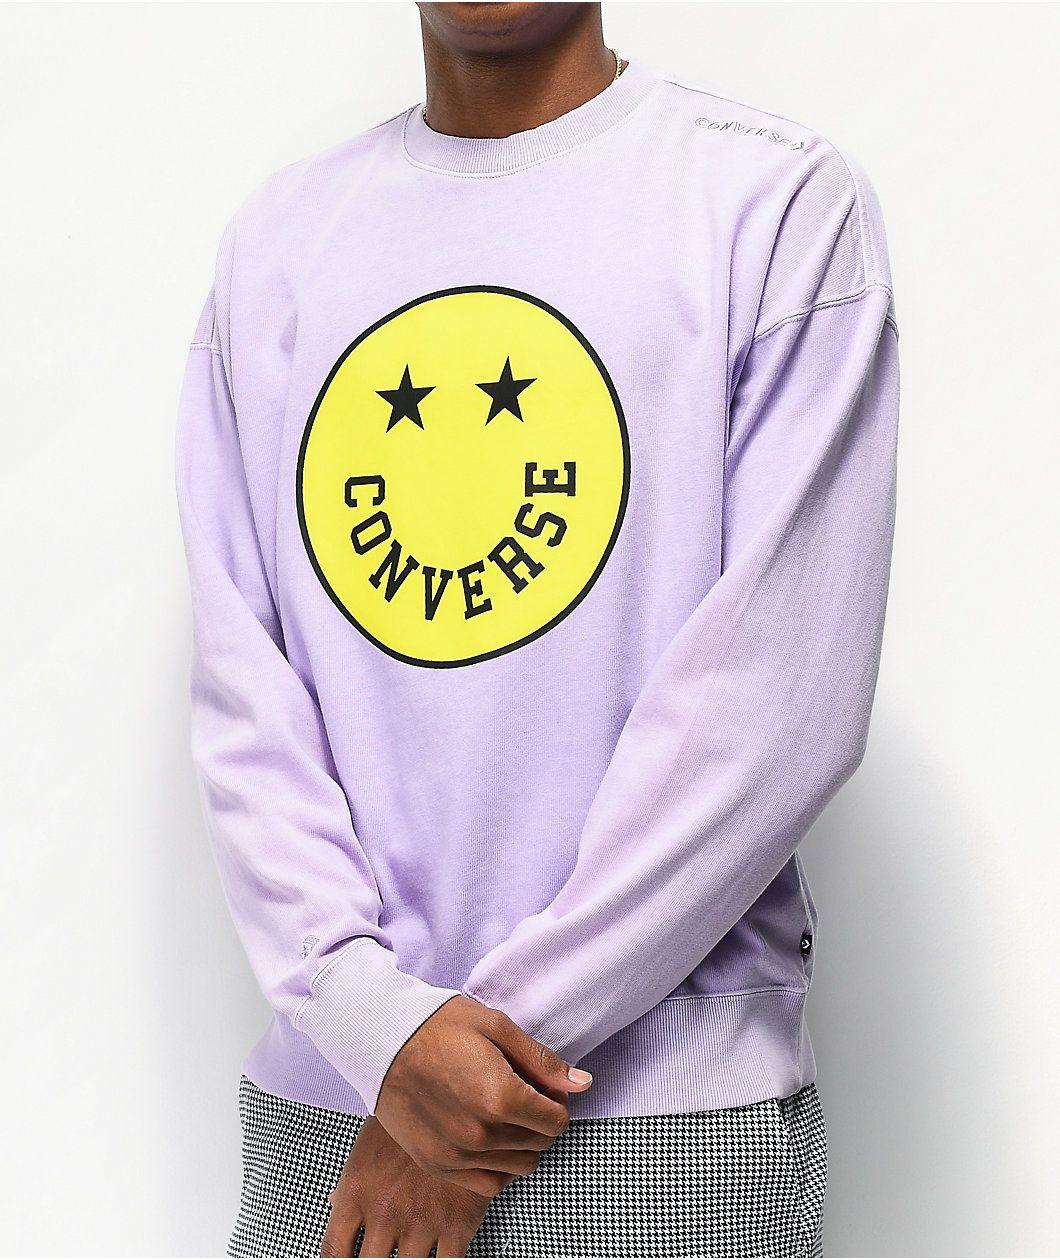 Converse Utility Violet Crew Neck Sweatshirt Zumiez Crew Neck Sweatshirt Sweatshirts Crew Neck [ 1260 x 1060 Pixel ]